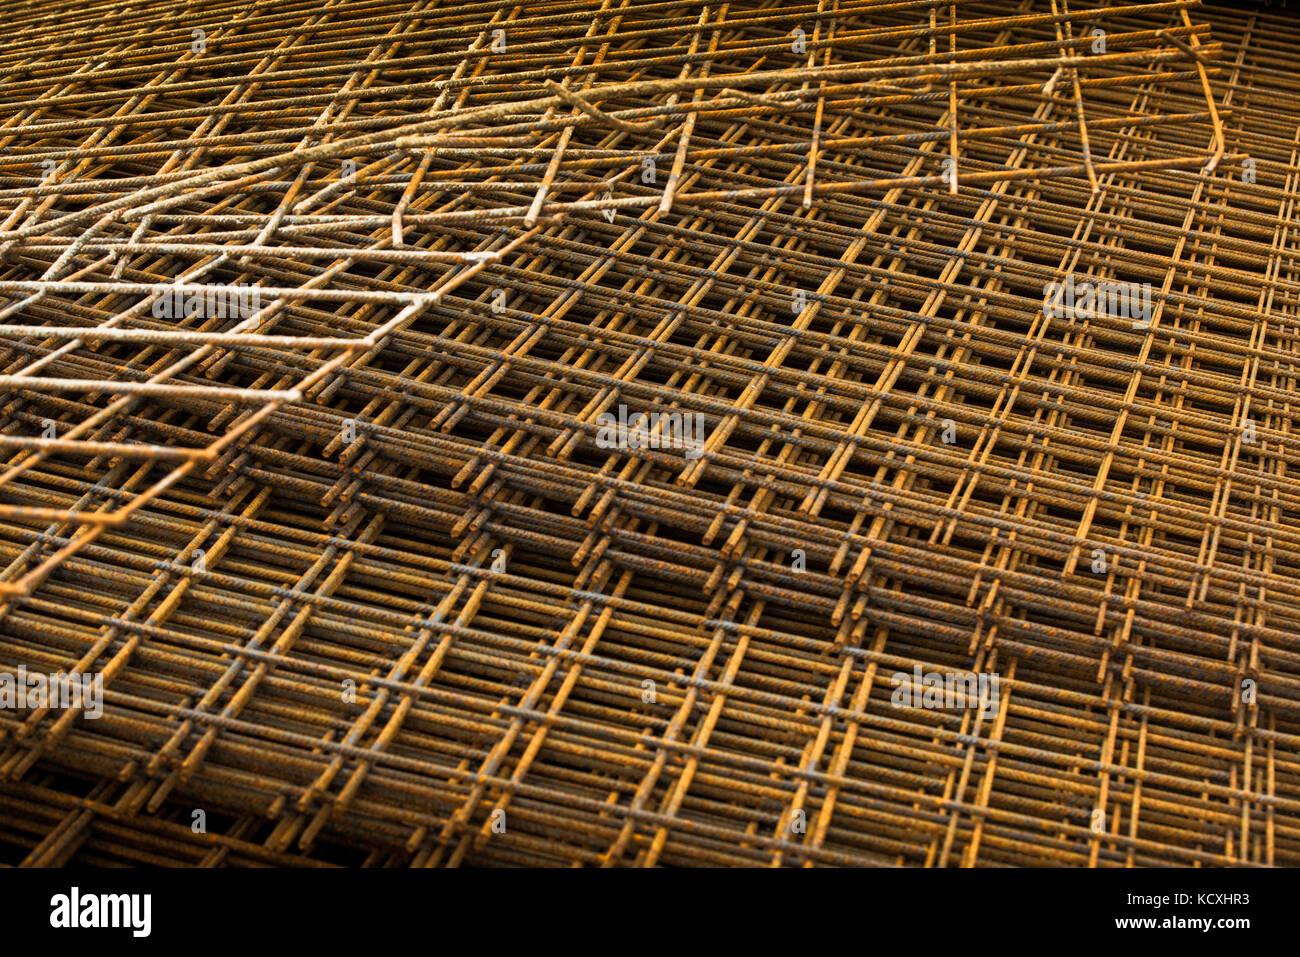 Steel Reinforcement Cage Stock Photos Amp Steel